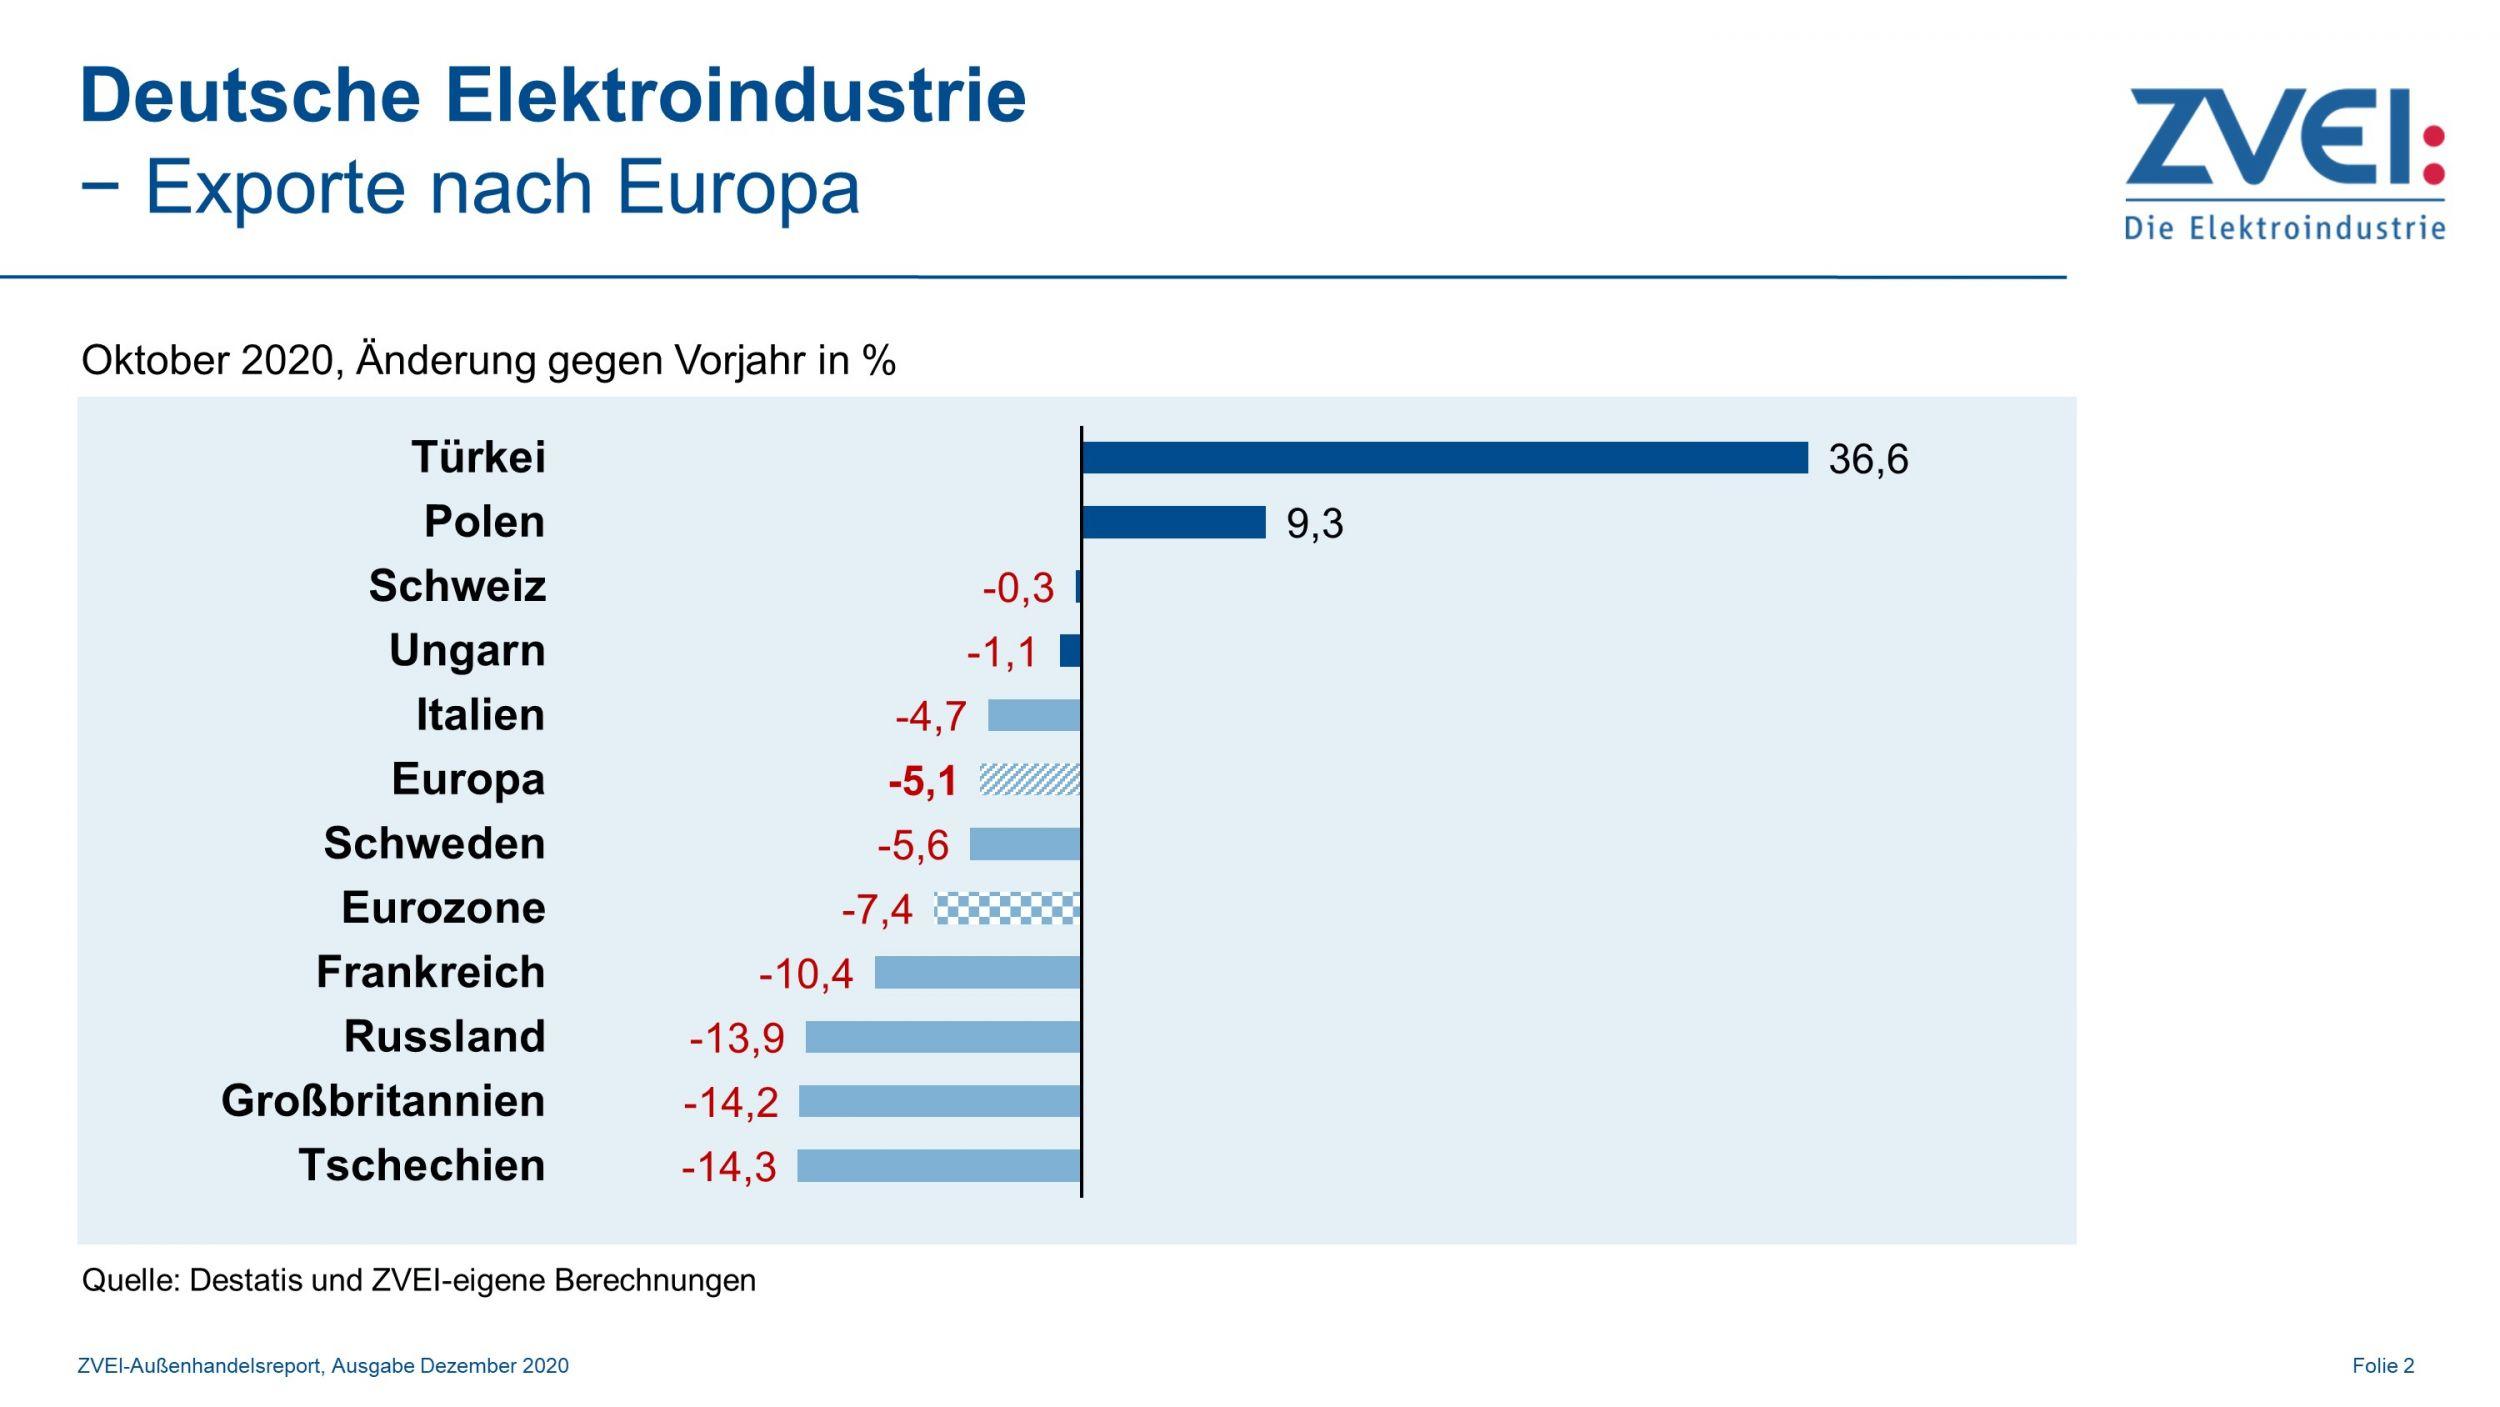 Deutsche Elektroexporte nach Europa im Oktober 2020